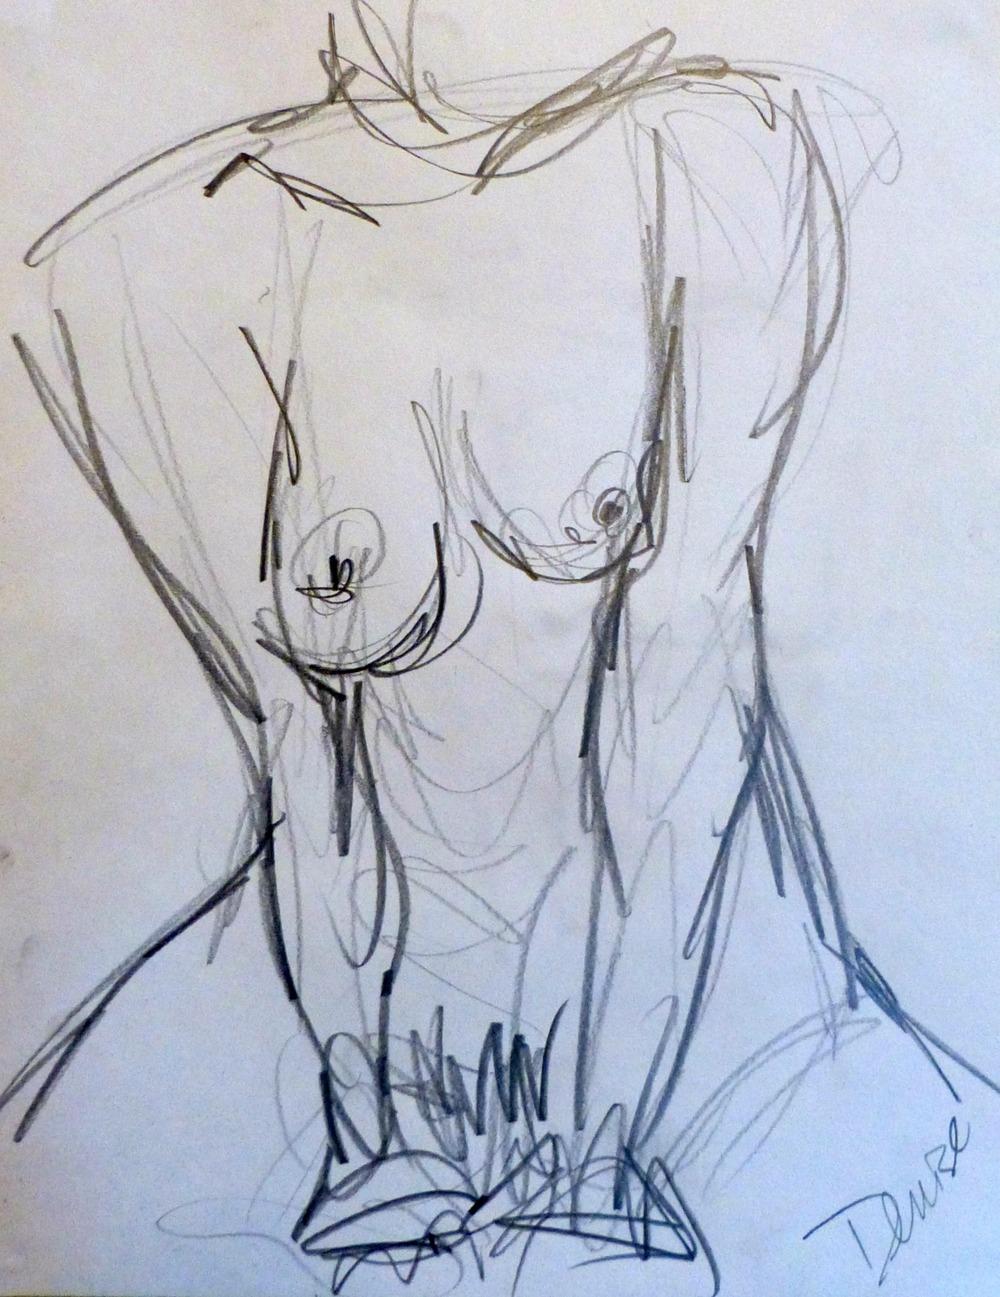 nwm - Sketch - female figure.jpg